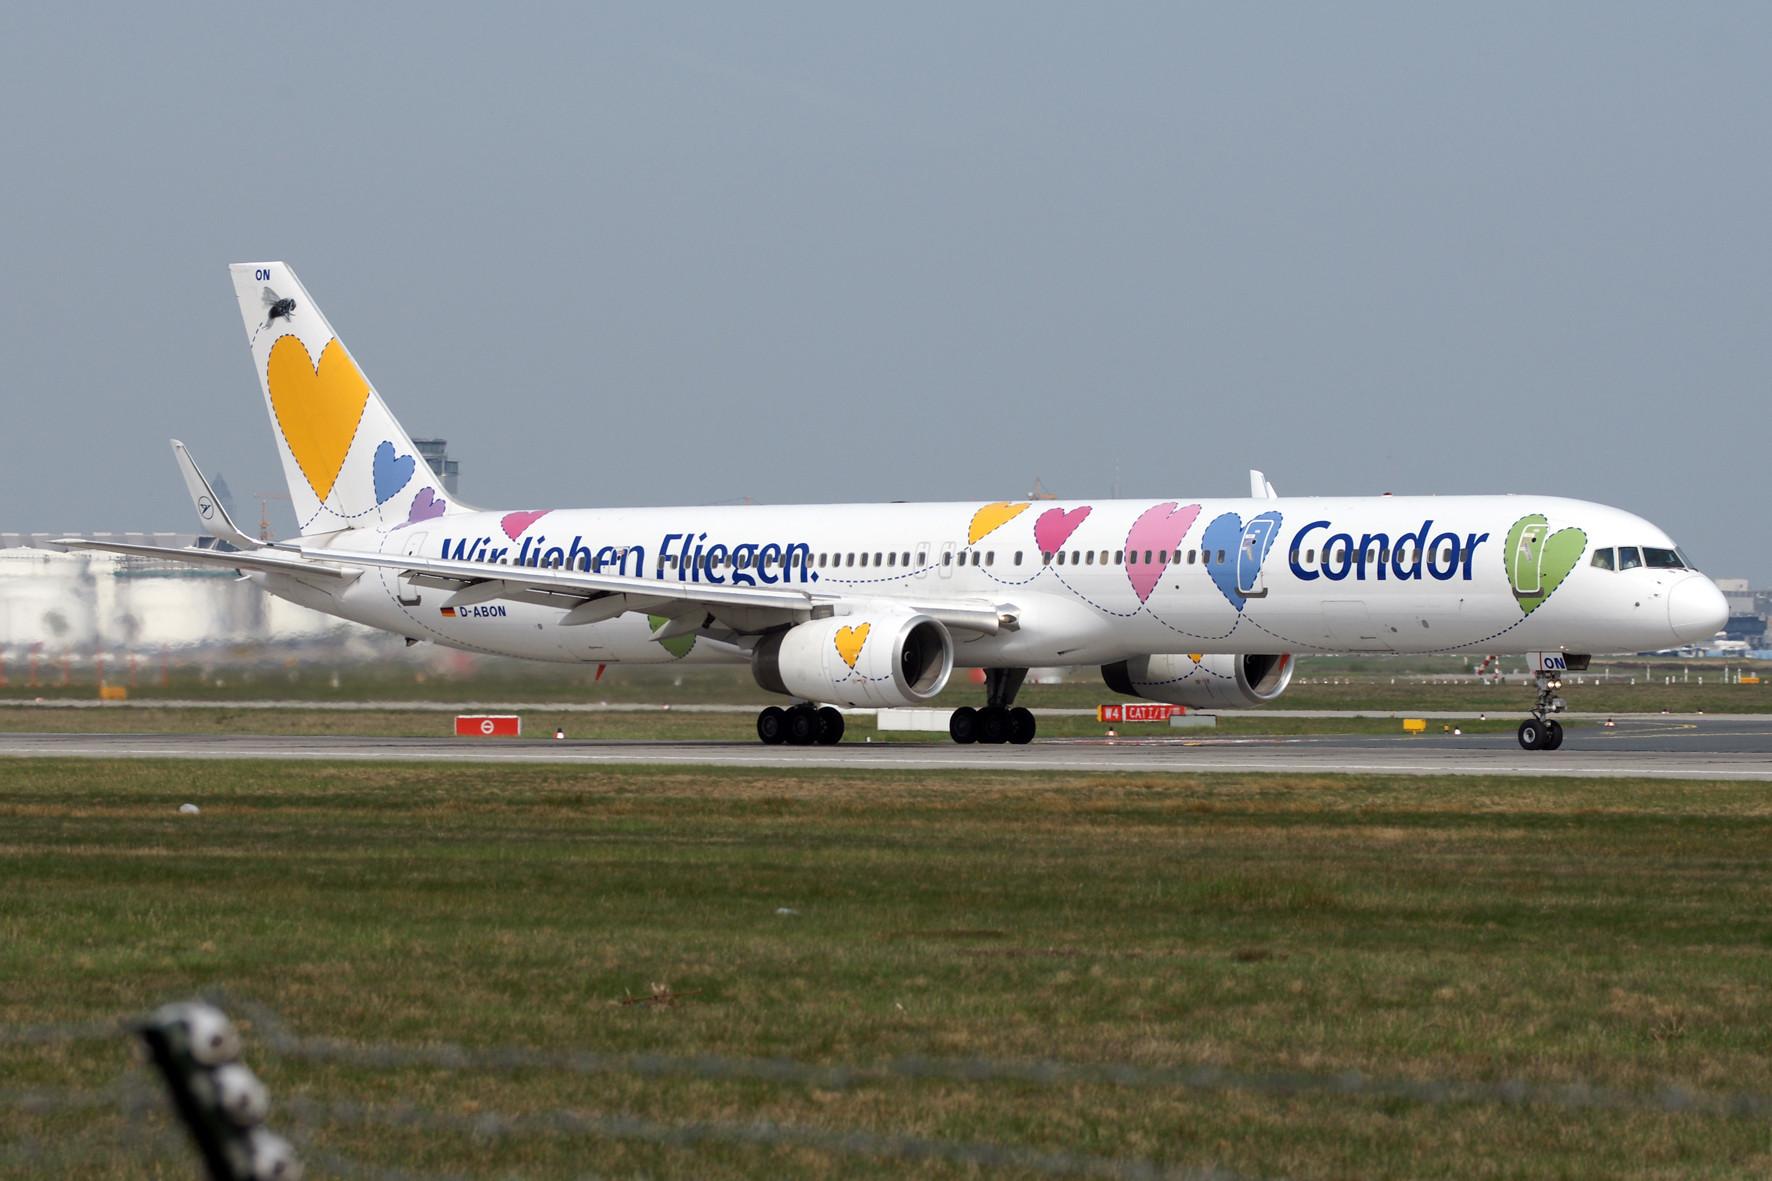 bs-bz-condor-airlines-20151104